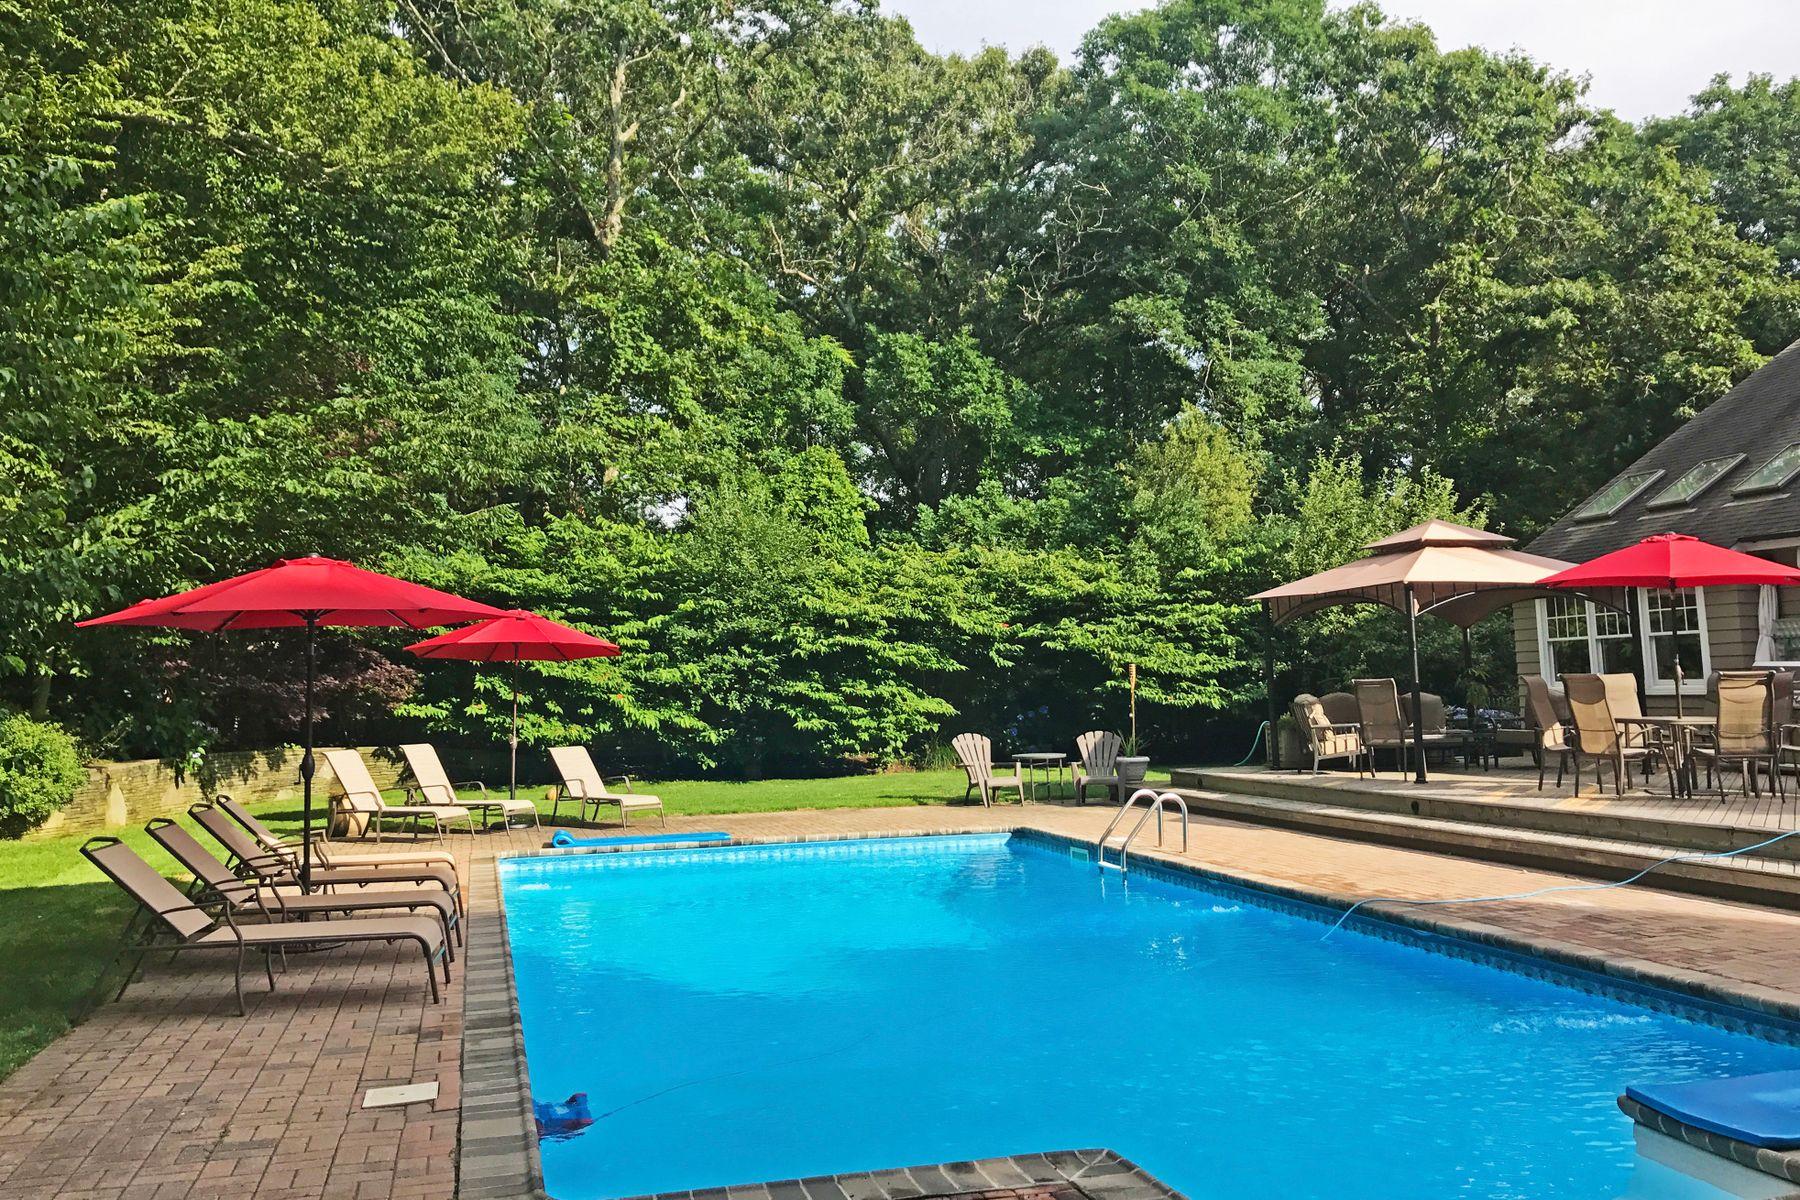 Single Family Home for Sale at East Hampton Golf Club Community 3 Addie Conklin Lane, East Hampton, New York, 11937 United States